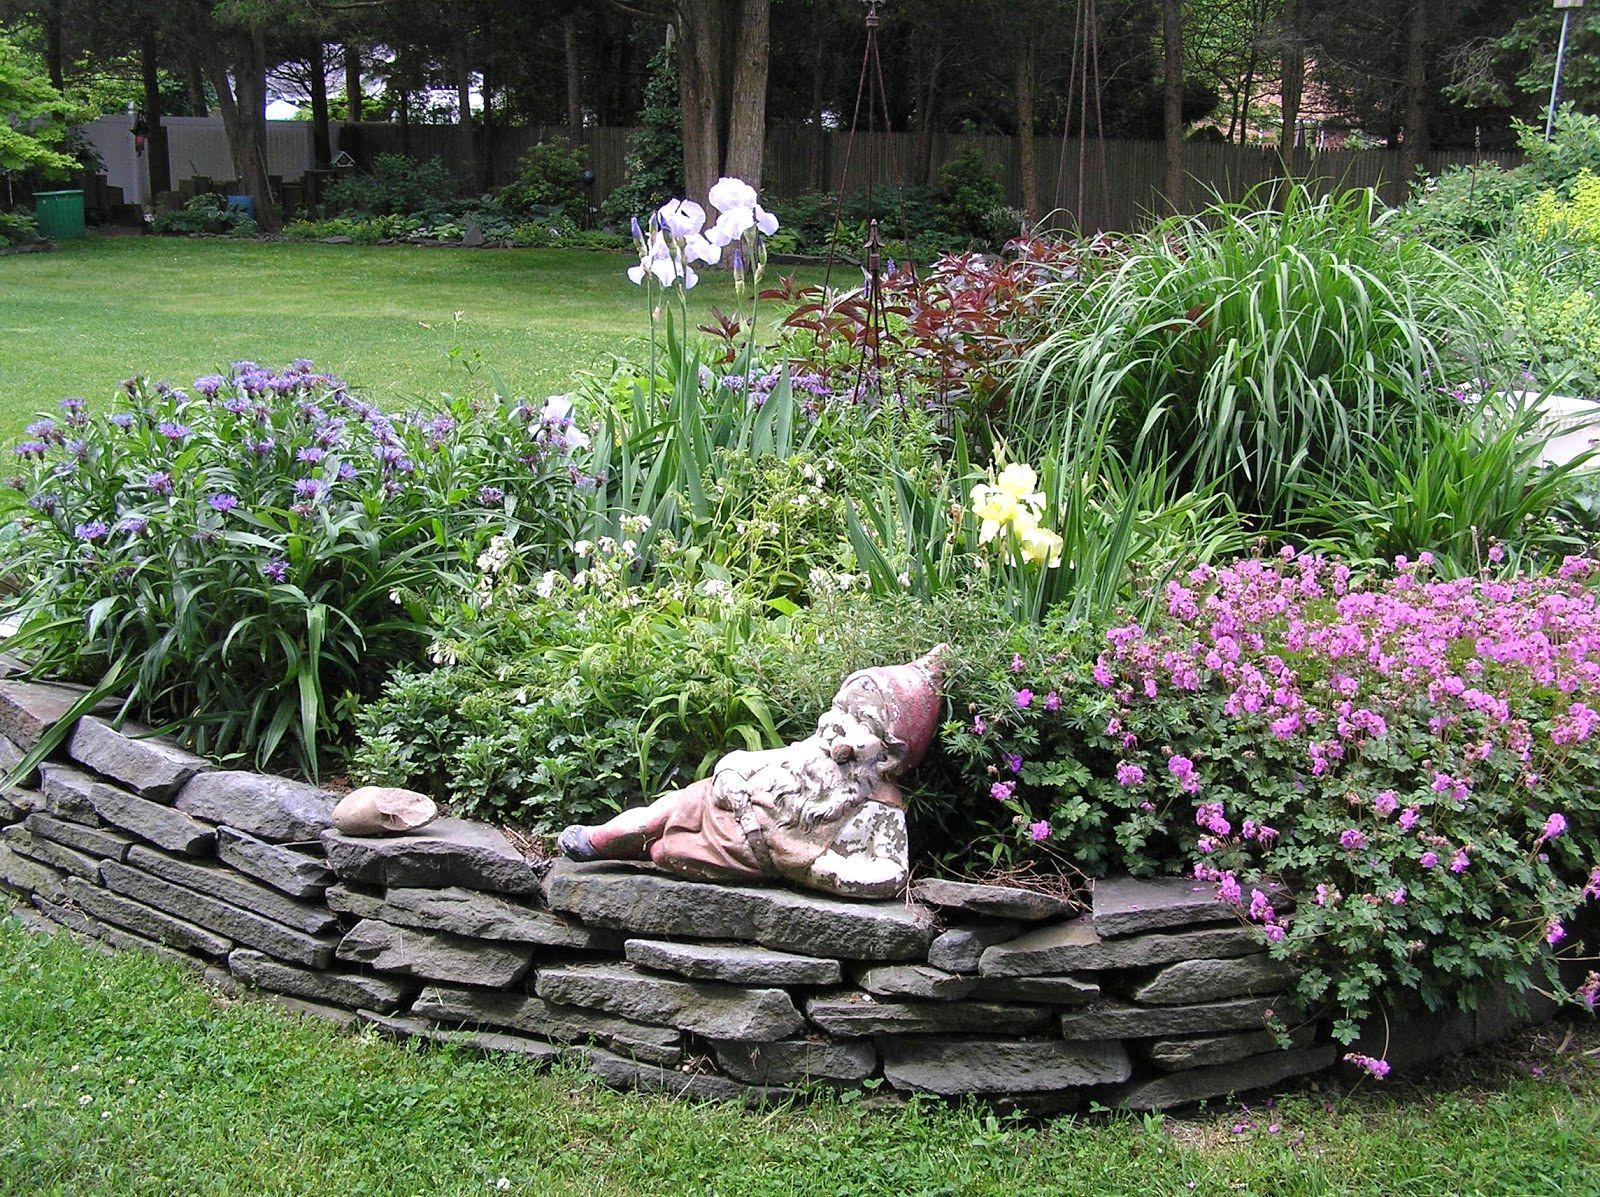 Slate Rock Garden Edging Old Country Gardens Raised   Raised ... on raised rock garden ideas, raised vegetable garden plans, raised flower garden ideas,